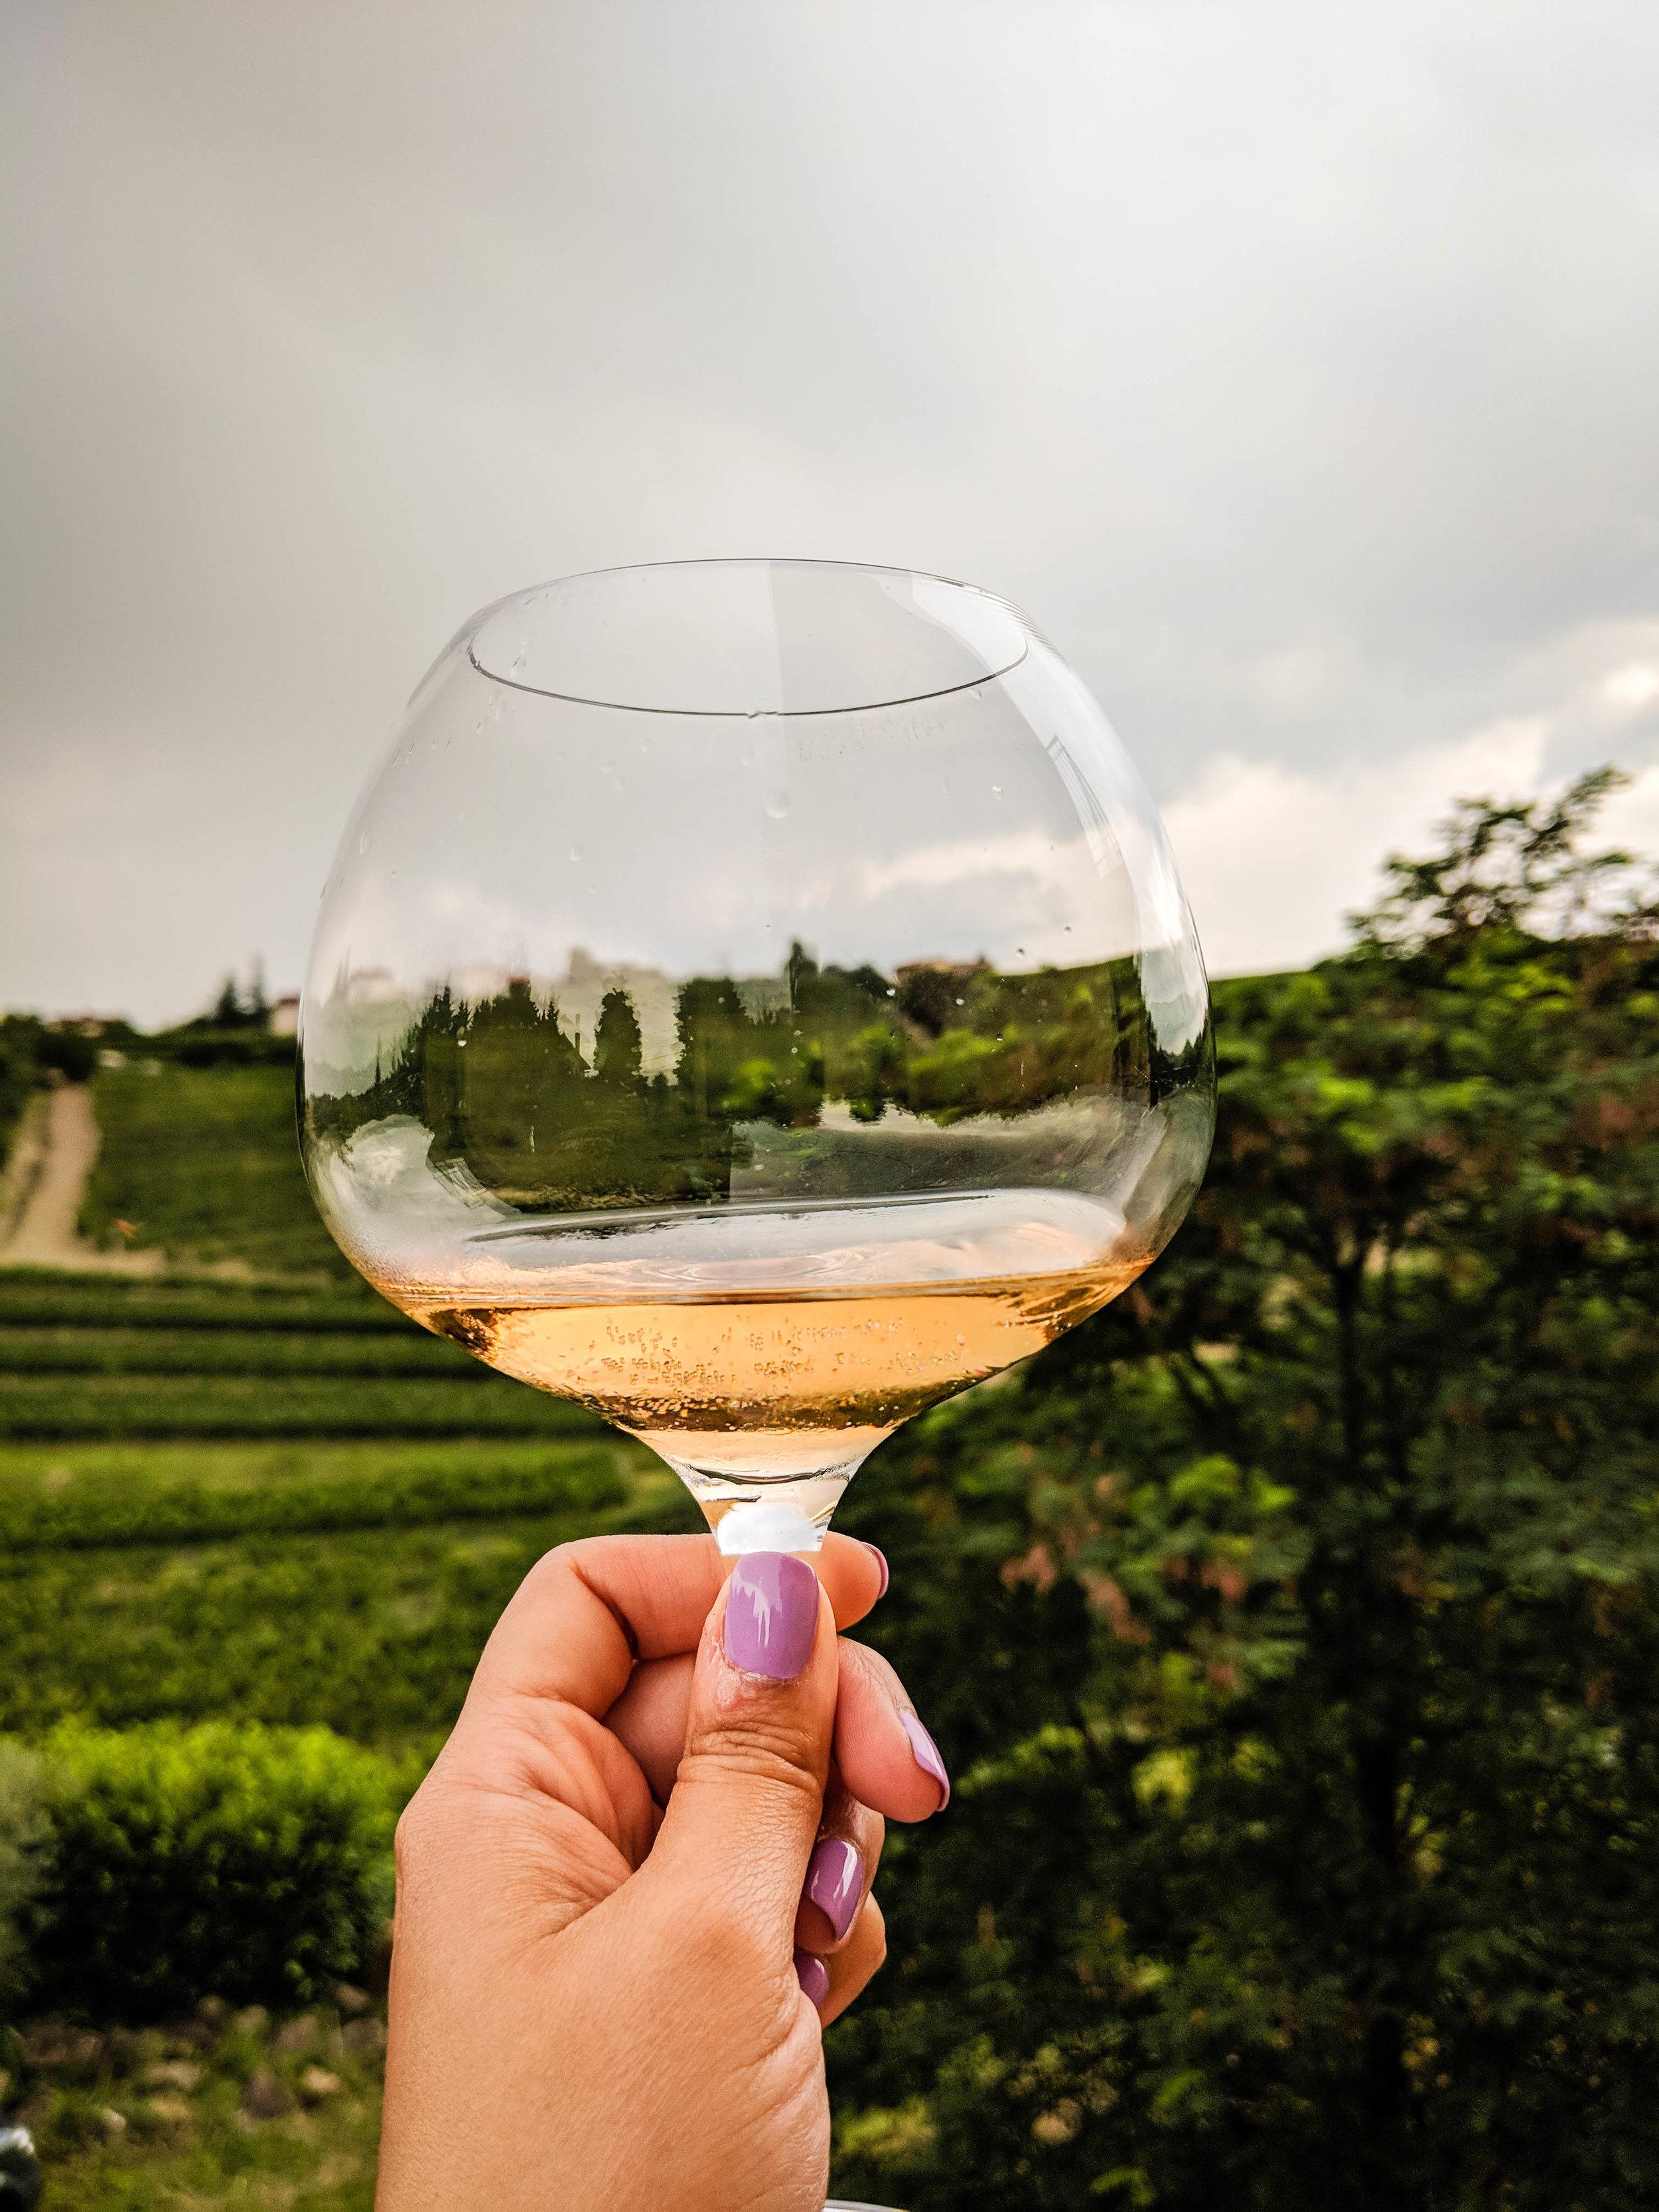 Brda wine region, part of the itinerary Road trip in Slovenia